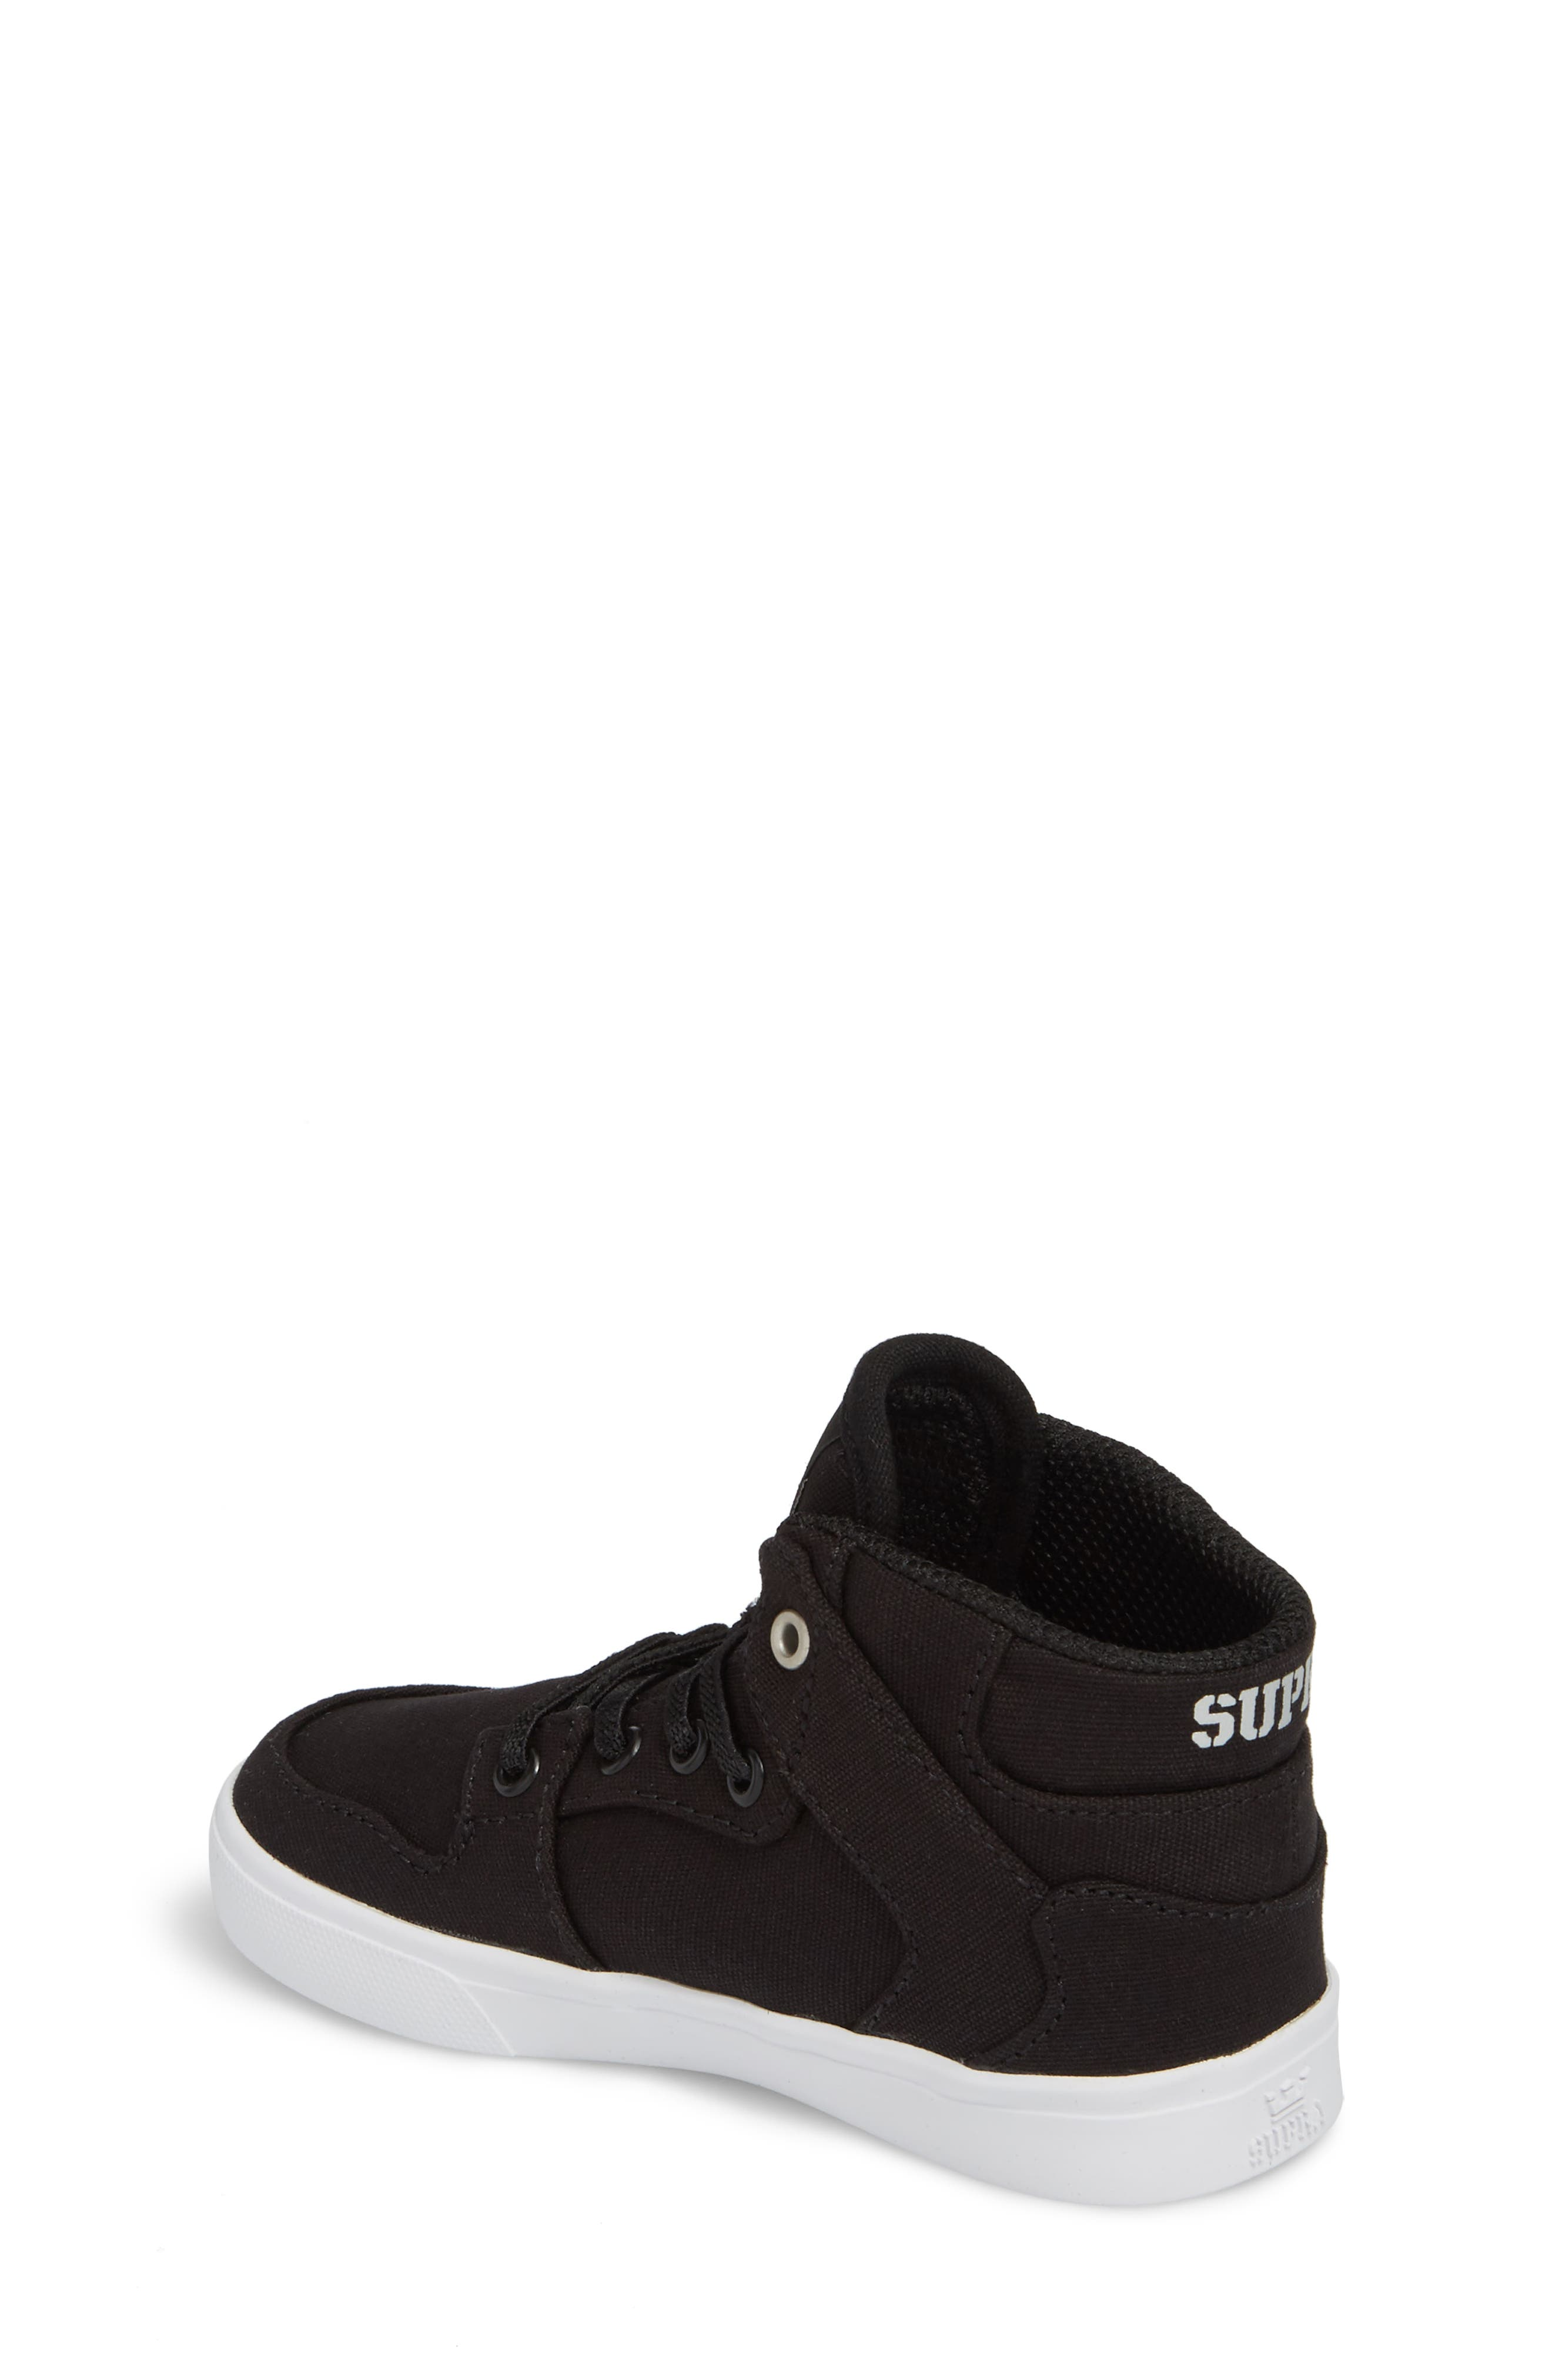 'Vaider' High Top Sneaker,                             Alternate thumbnail 2, color,                             Black/ White